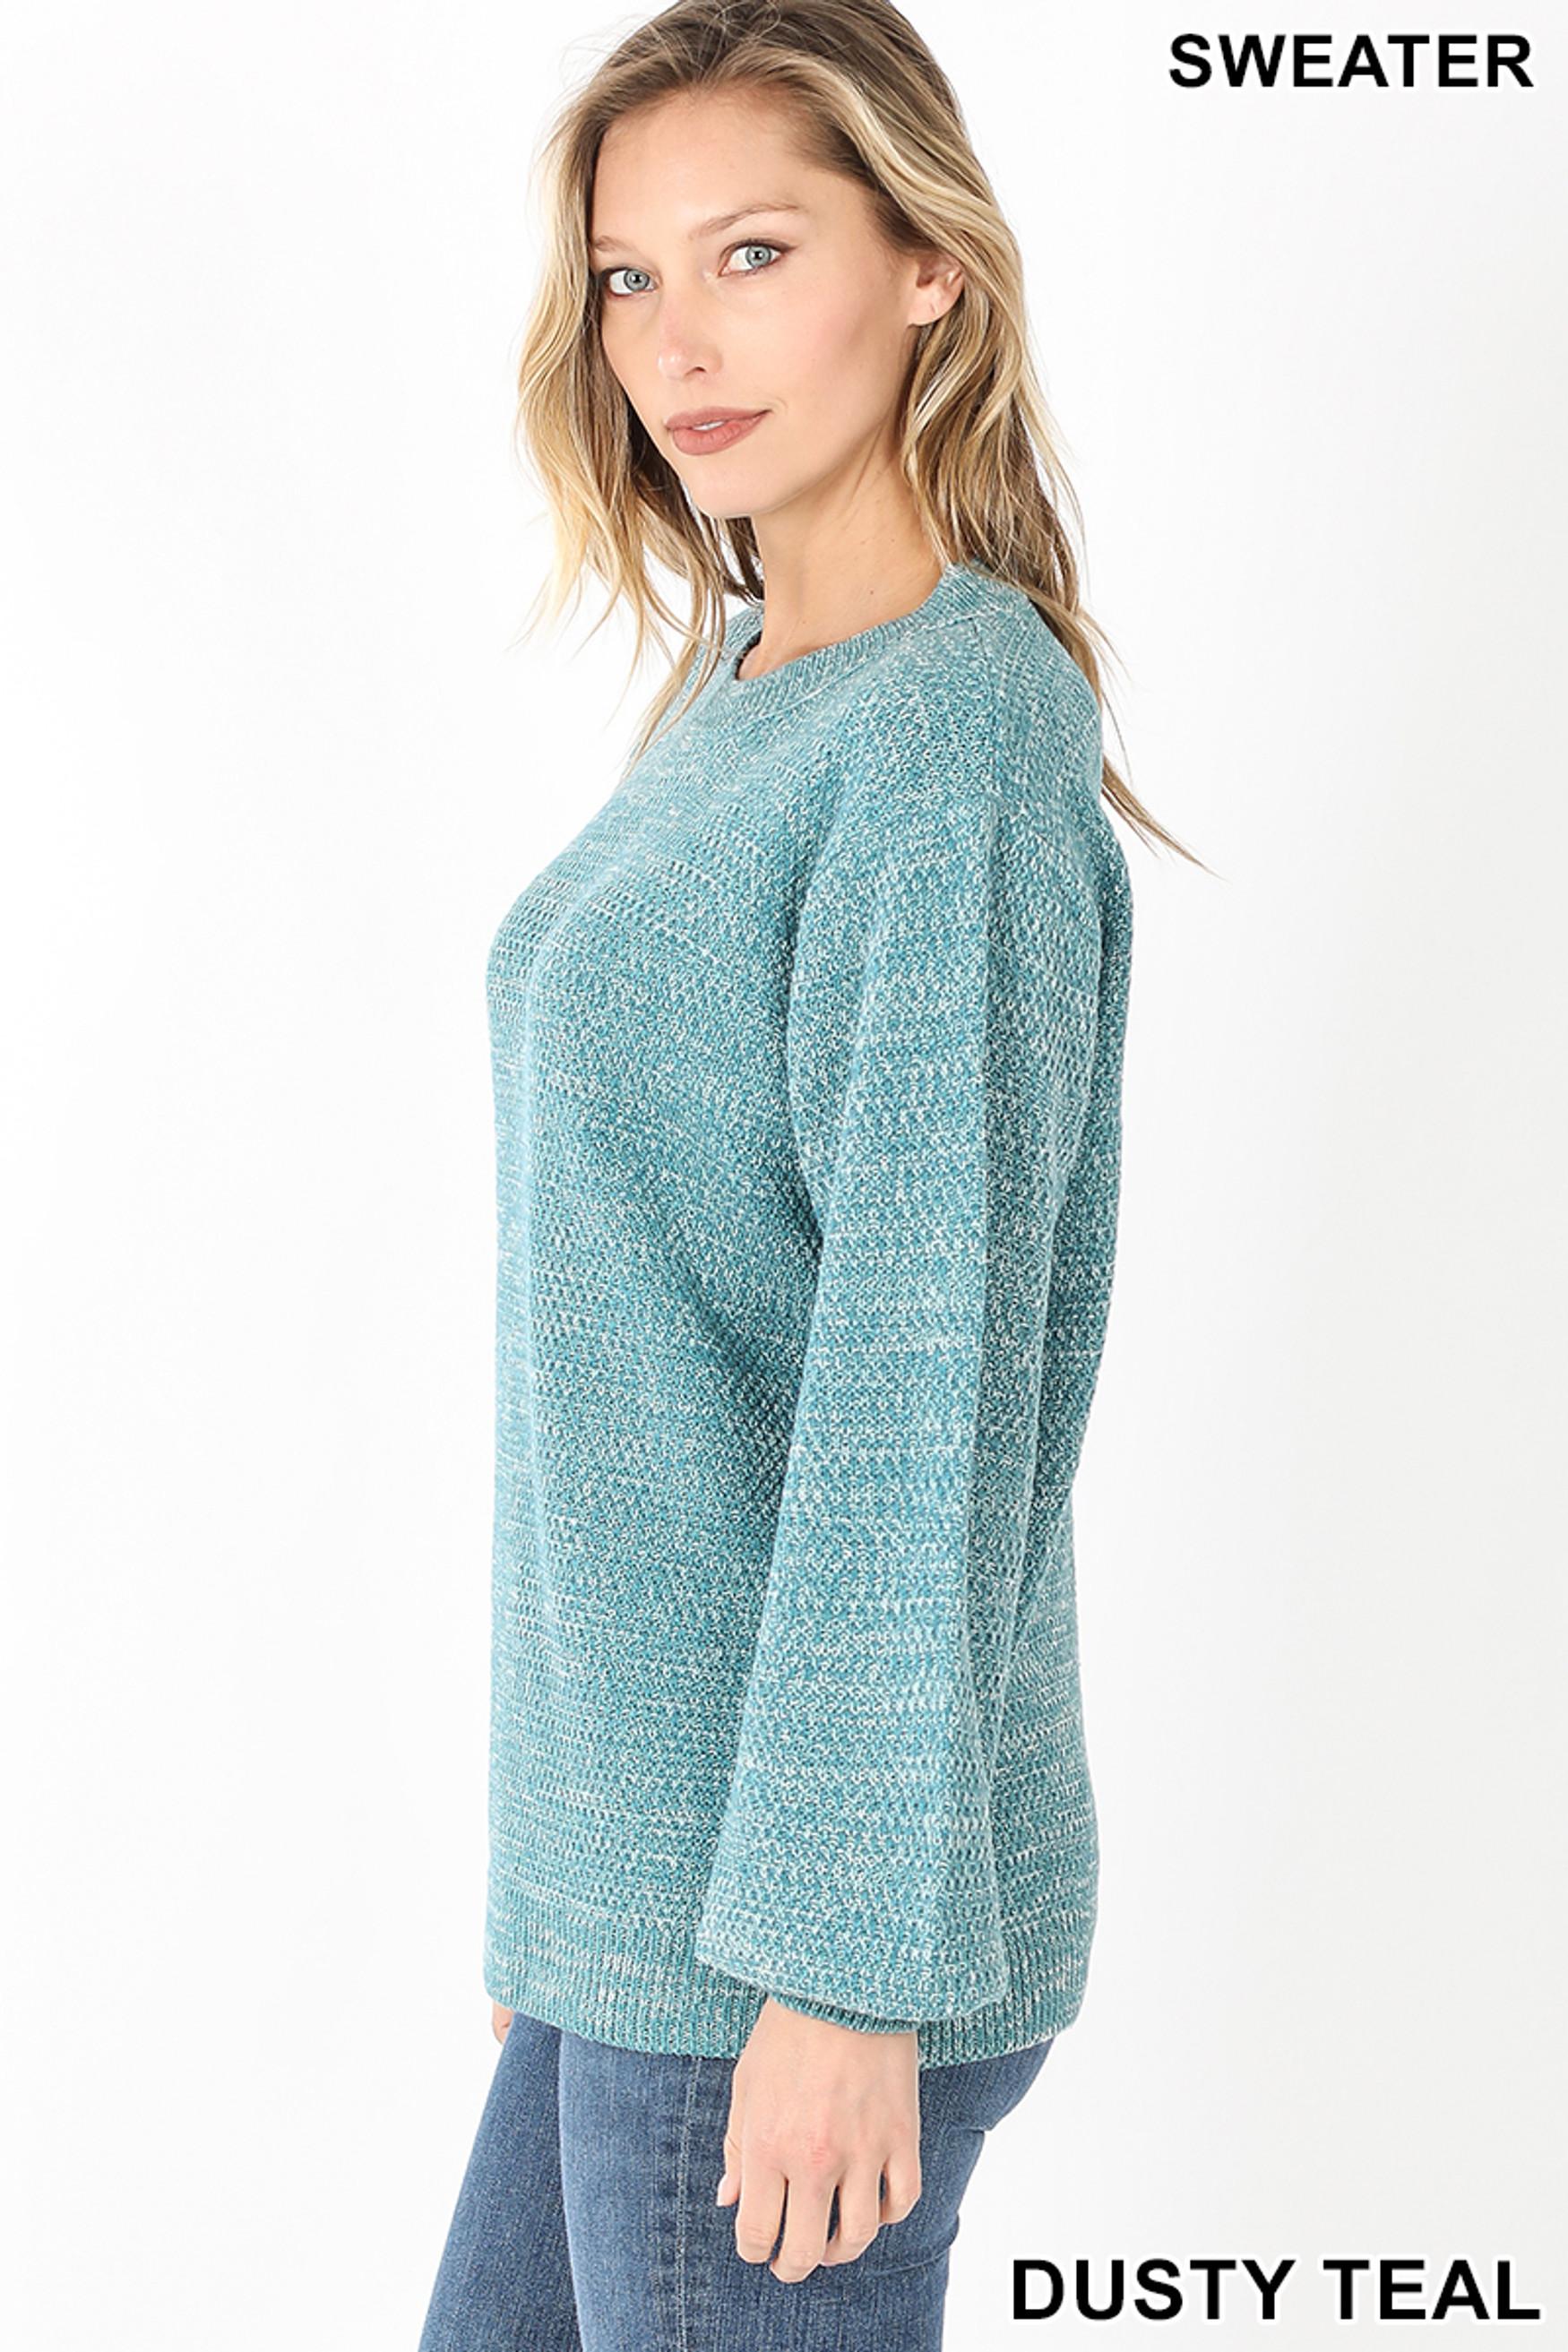 Left side view of Dusty Teal Balloon Sleeve Melange Sweater